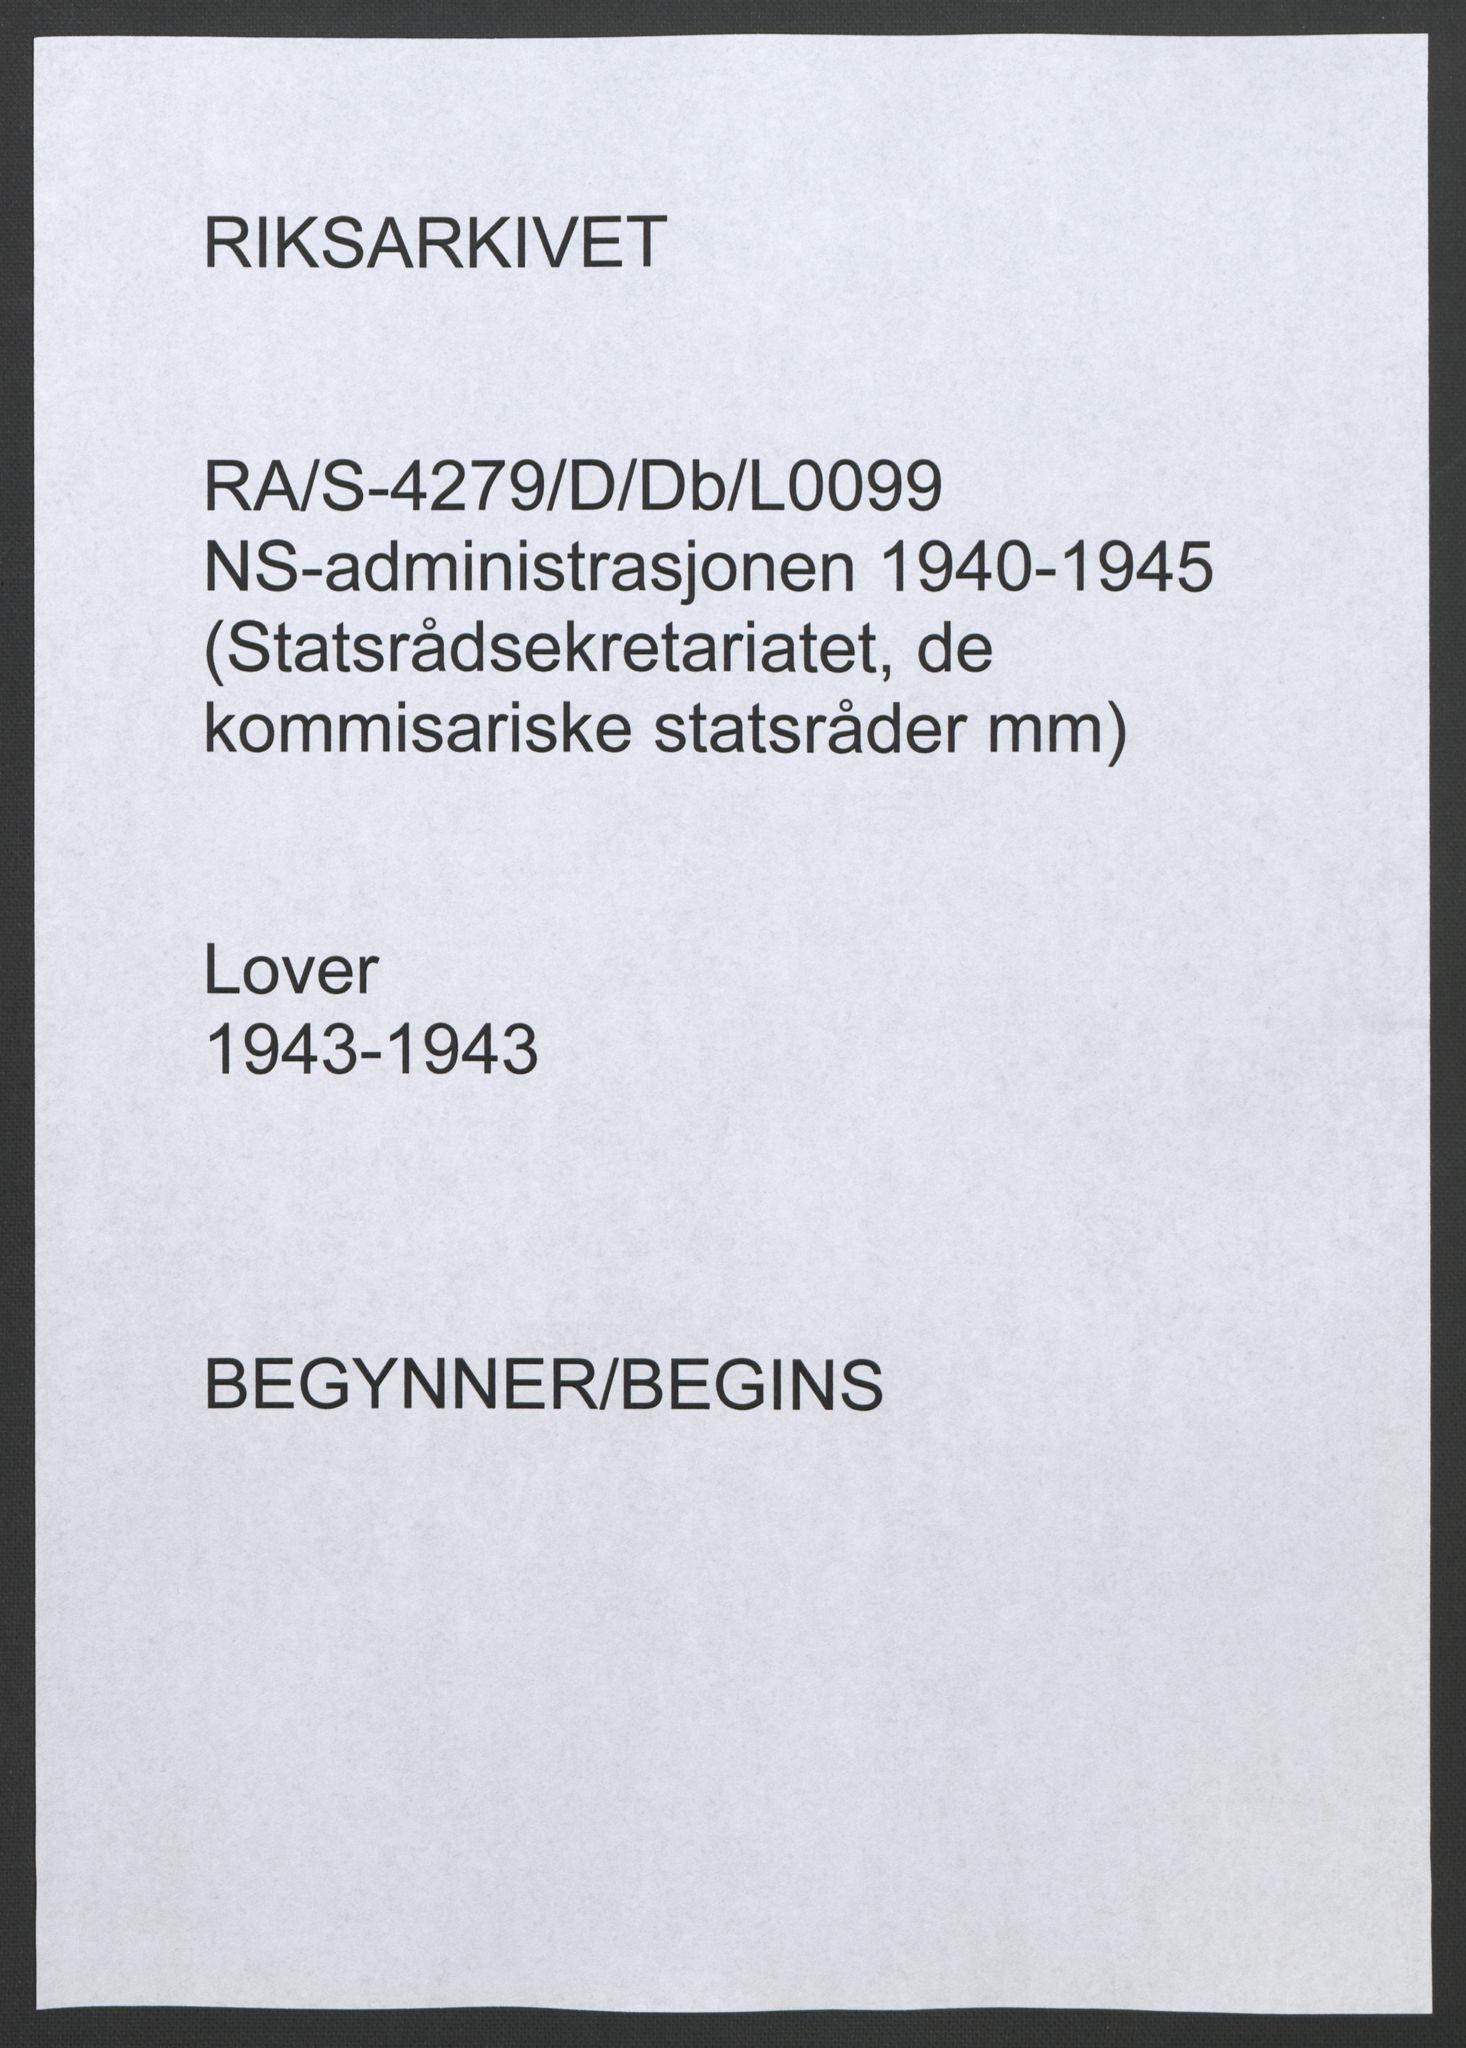 RA, NS-administrasjonen 1940-1945 (Statsrådsekretariatet, de kommisariske statsråder mm), D/Db/L0099: Lover, 1943, s. 1